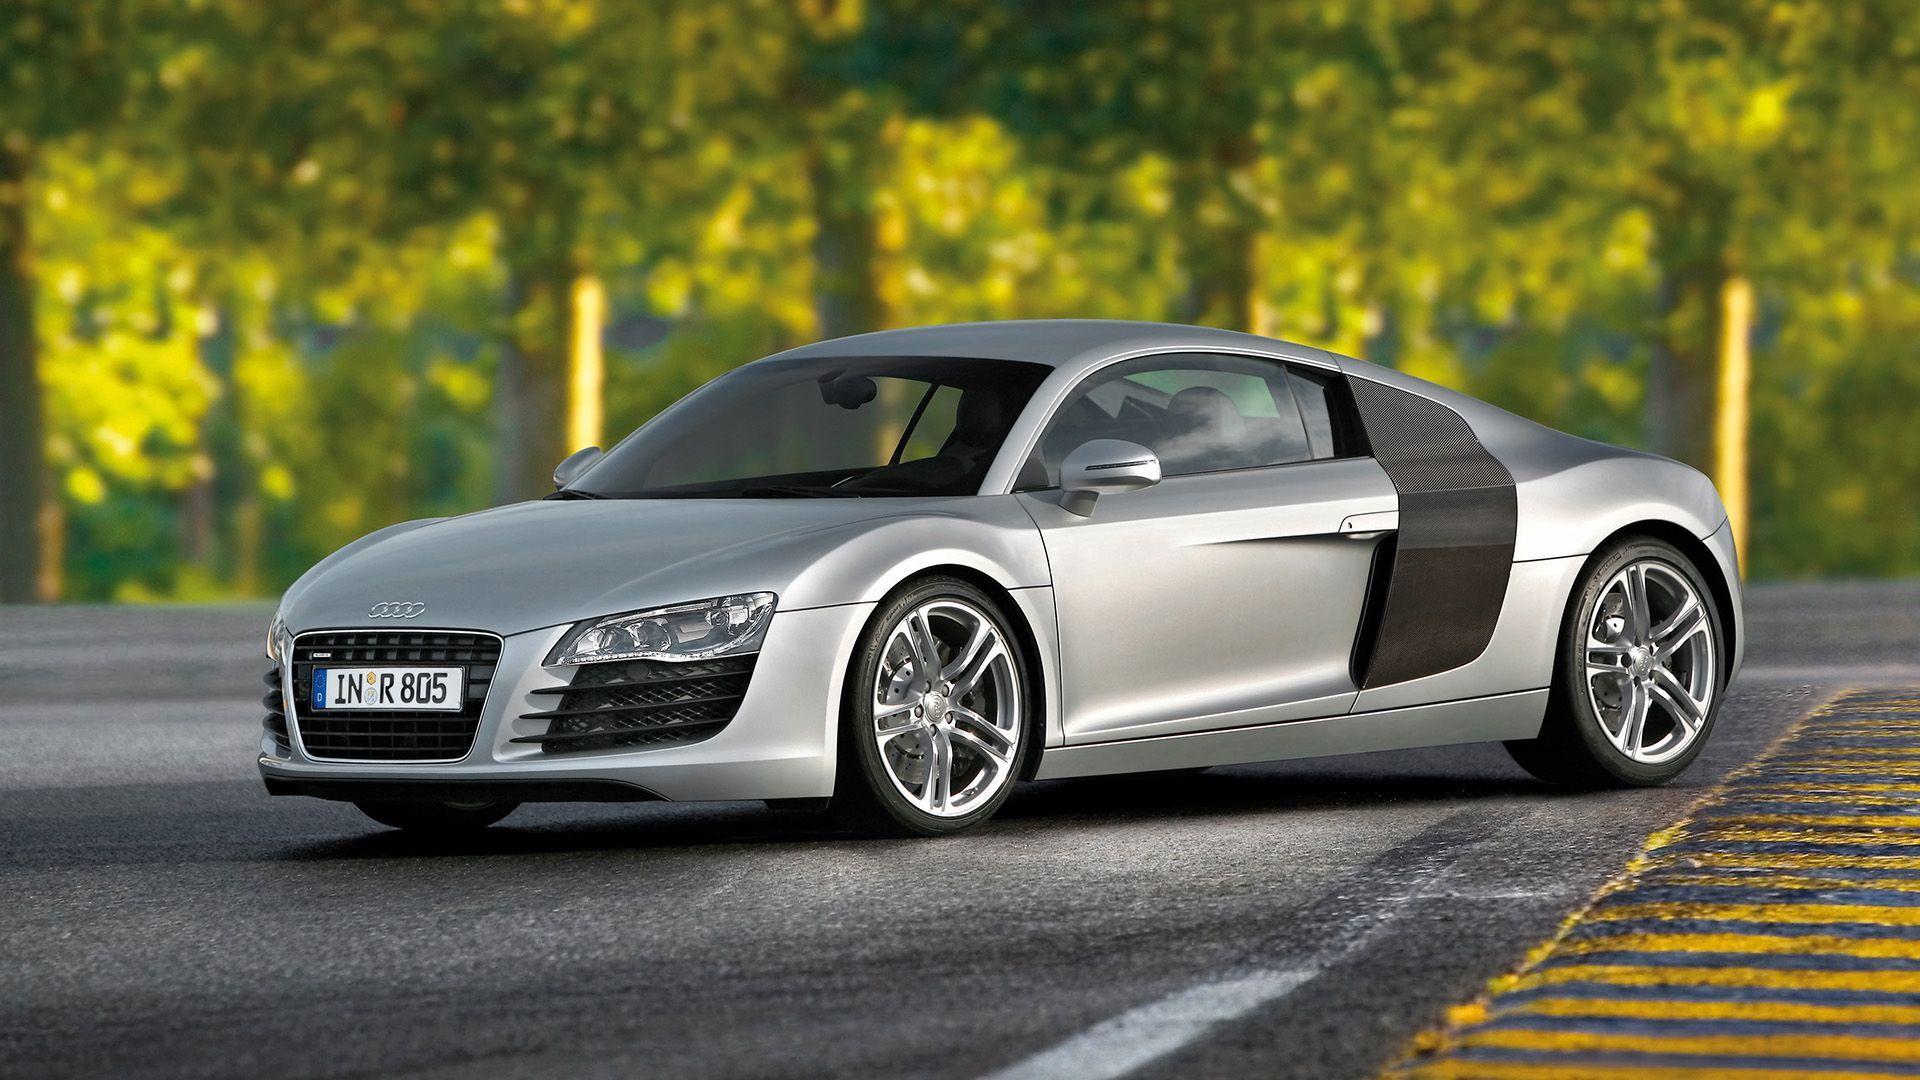 Hd wallpapers of cars - Audi Super Sport Car Hd Wallpapers 1080p Cars Beautiful Motors Pinterest Audi Super Sport And Wallpaper